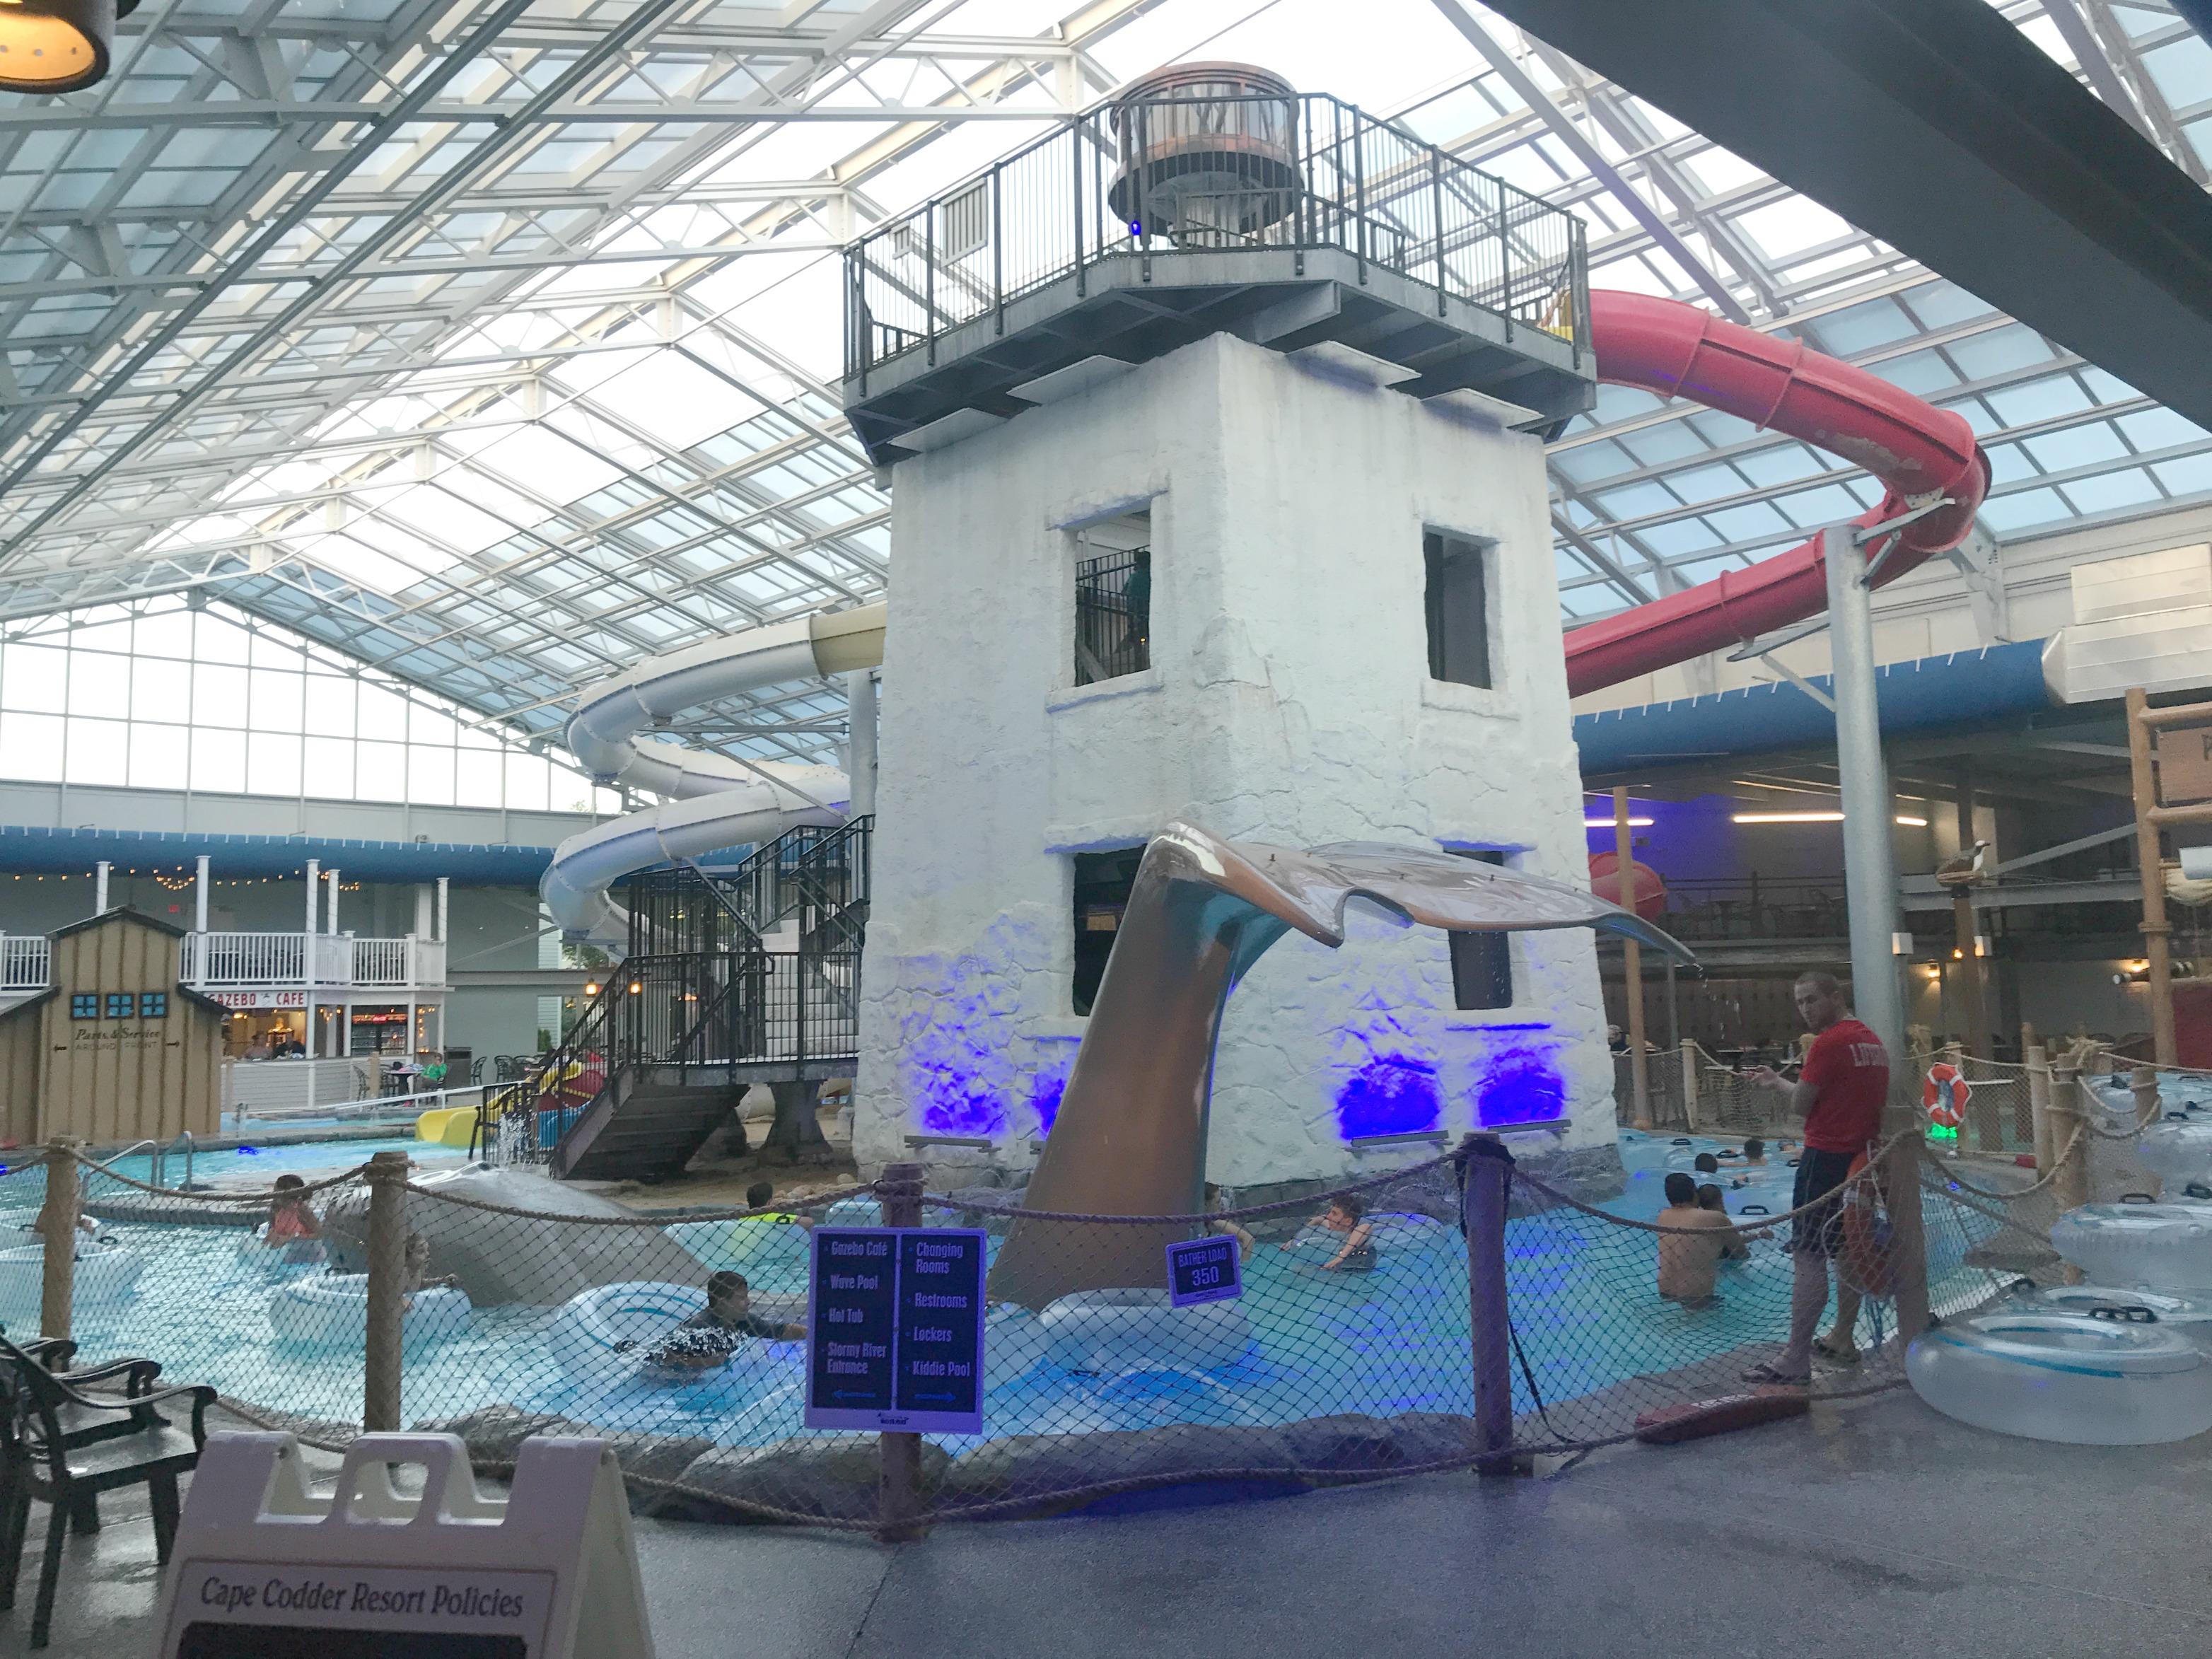 The Cape Codder Resort